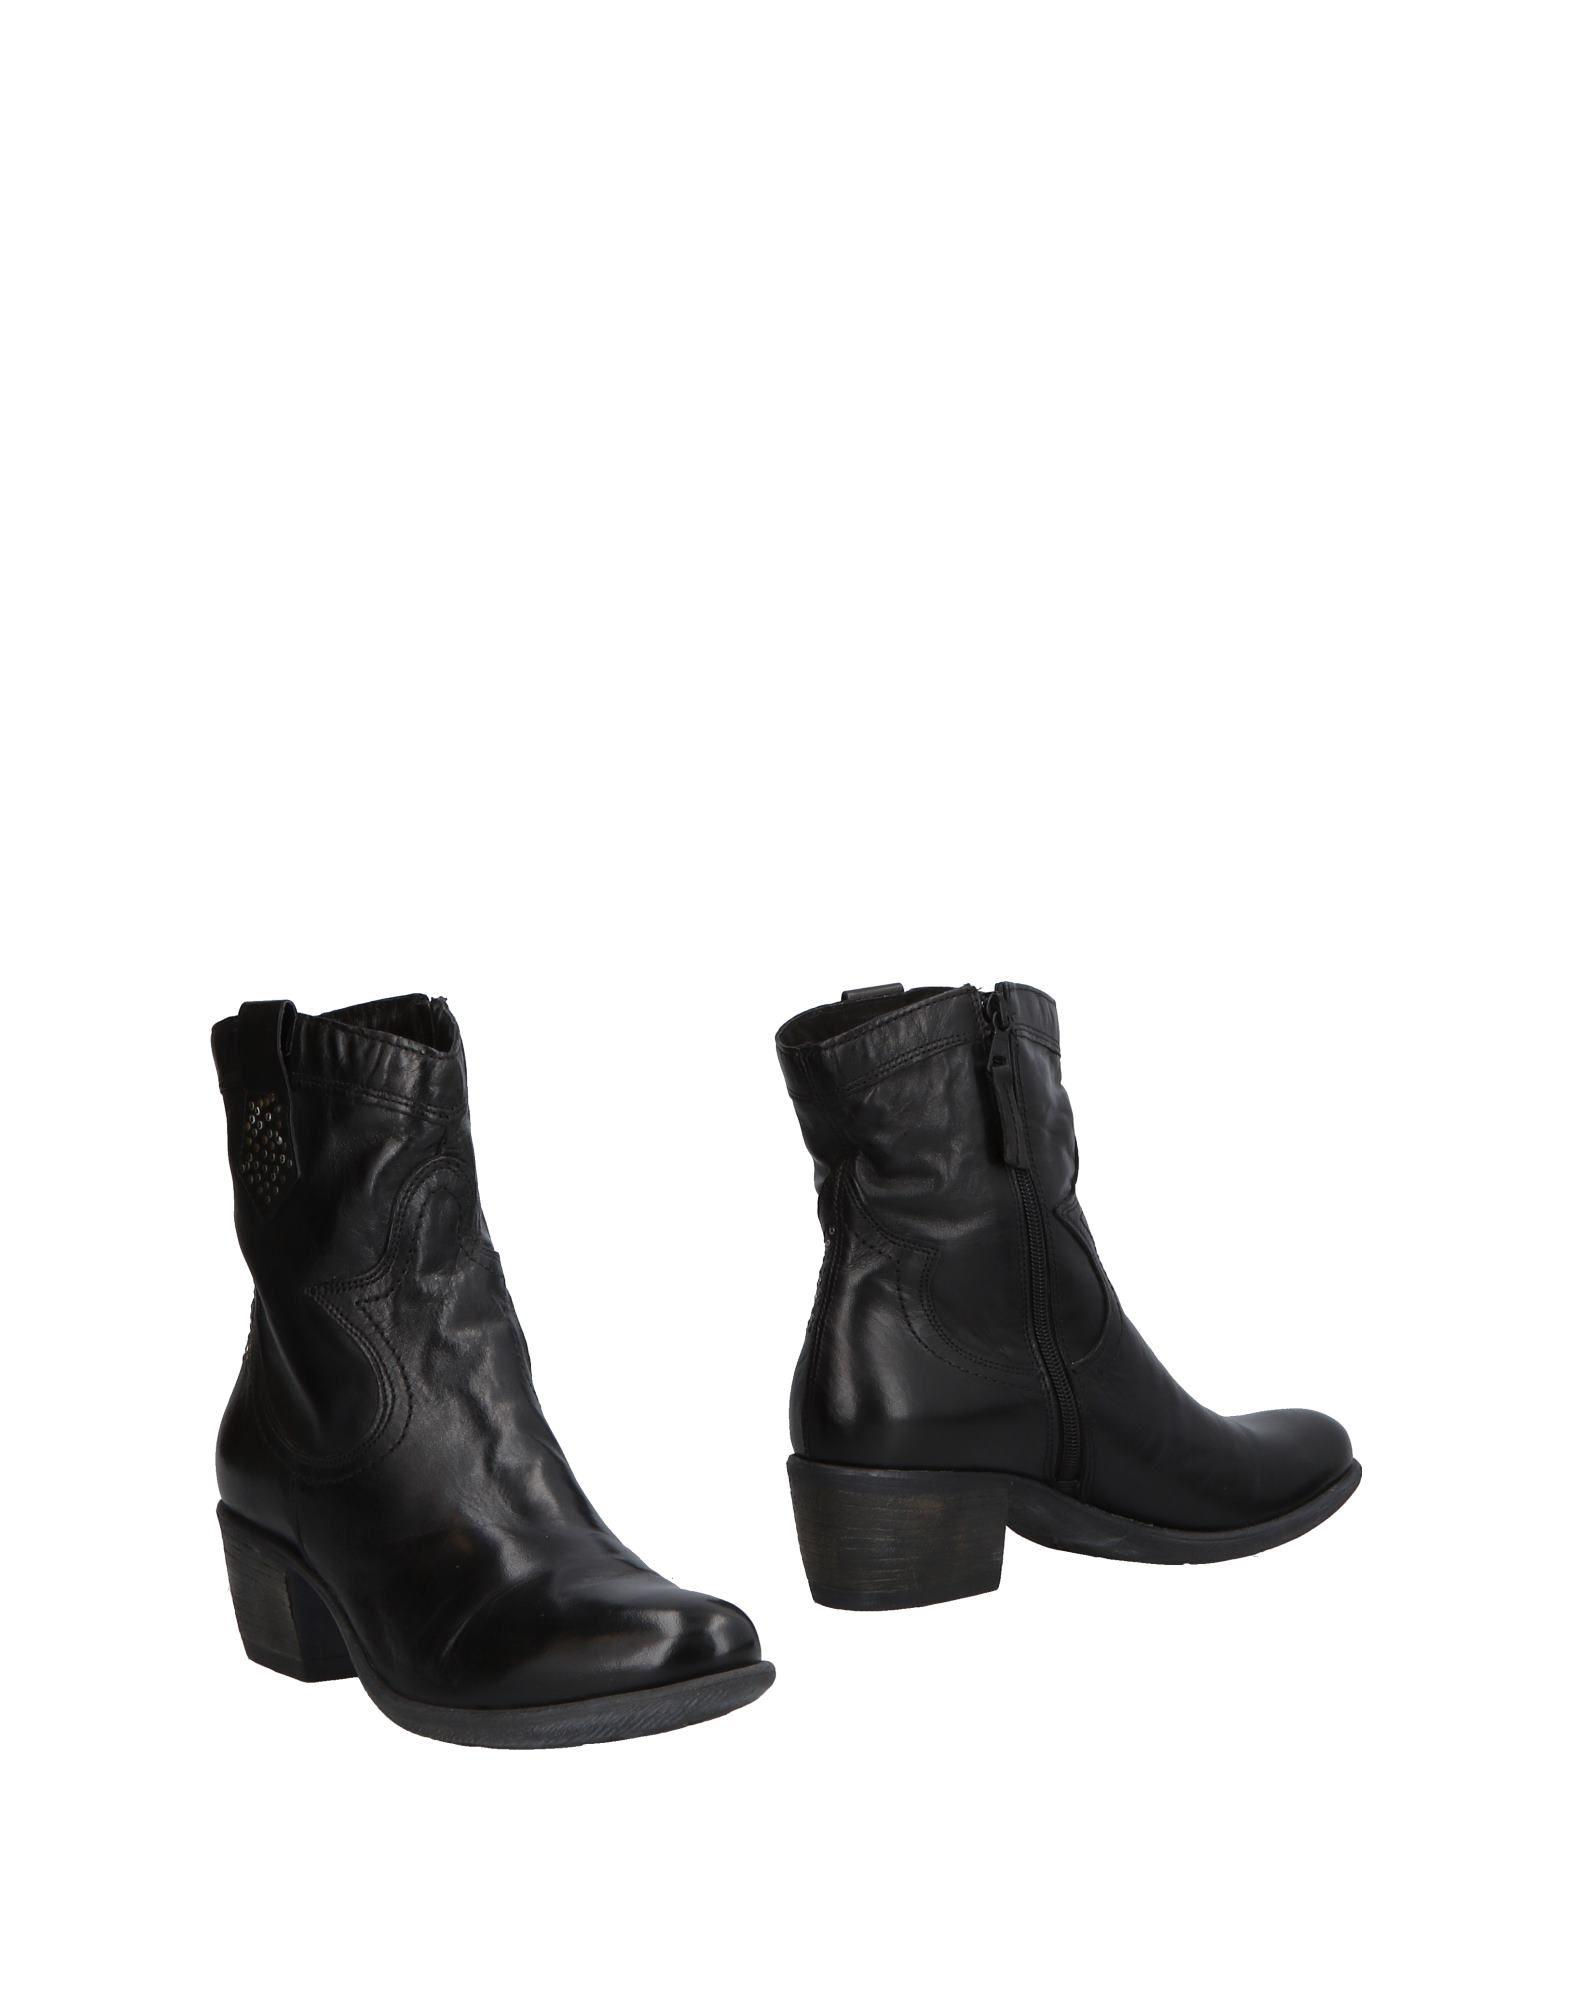 Mjus Ankle Boot Boot Boot - Women Mjus Ankle Boots online on  United Kingdom - 11485639RF ab8662